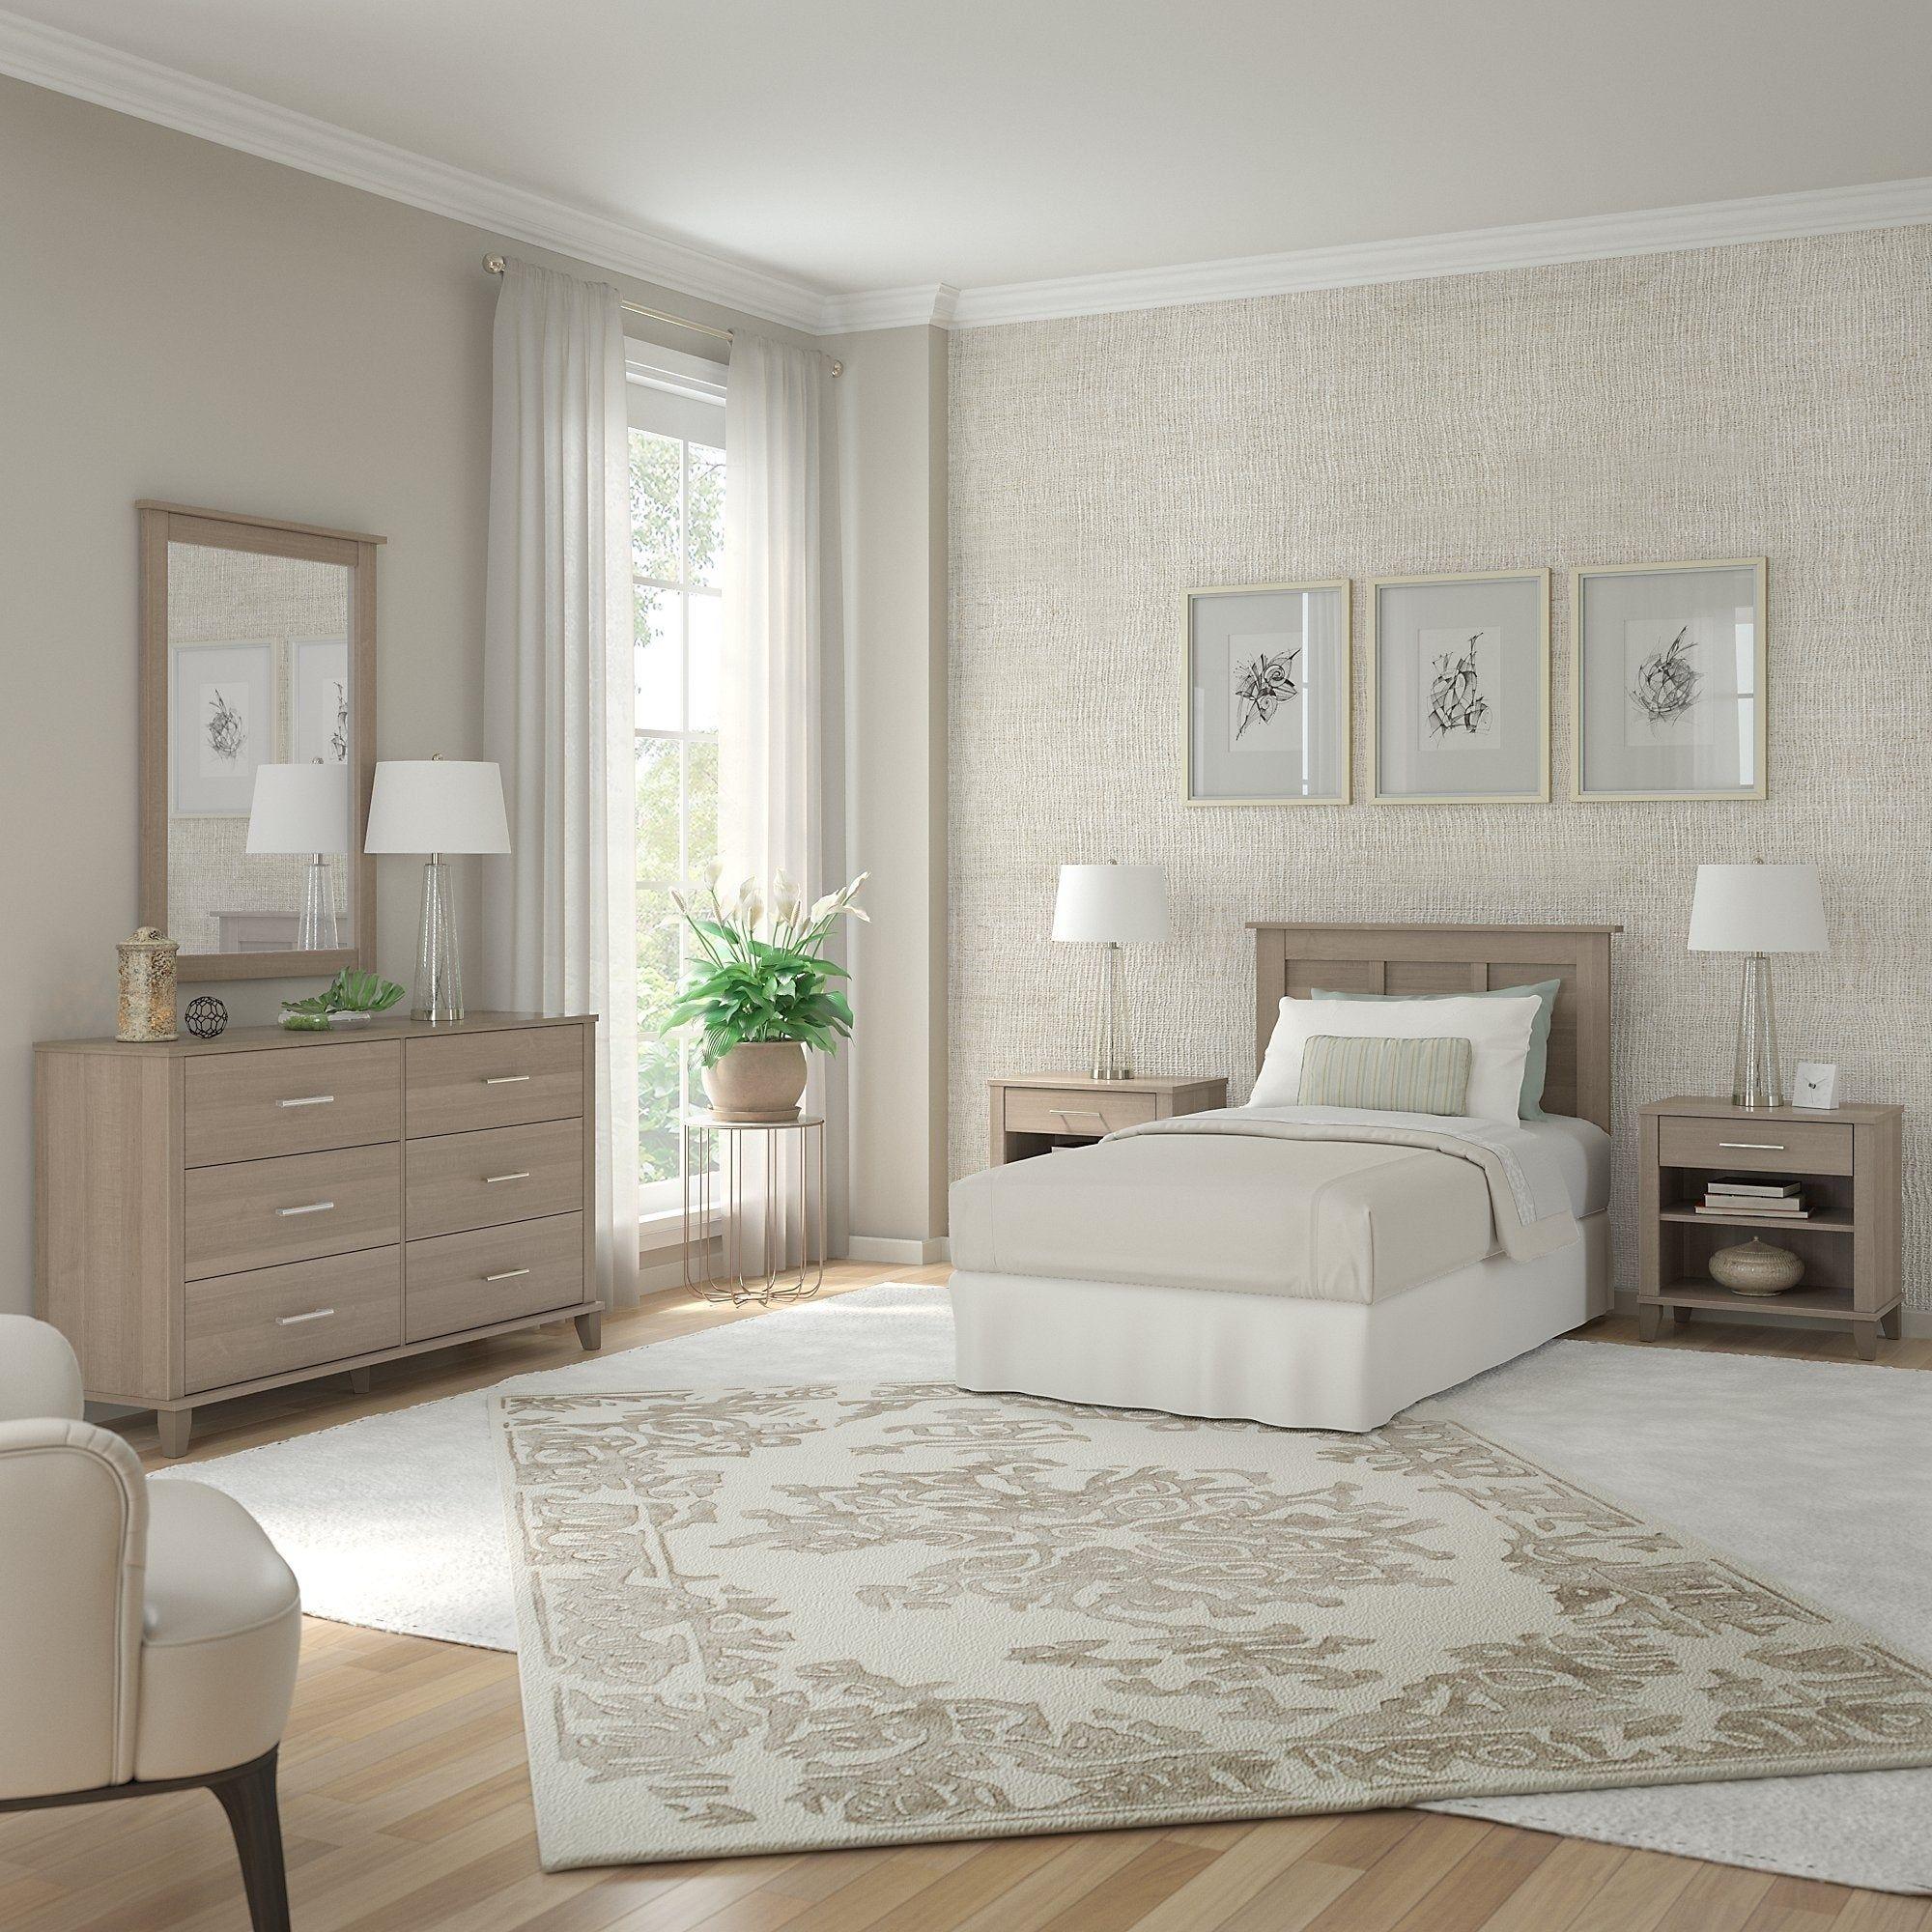 Best Somerset Twin Size 5 Piece Bedroom Set By Bush Furniture 640 x 480